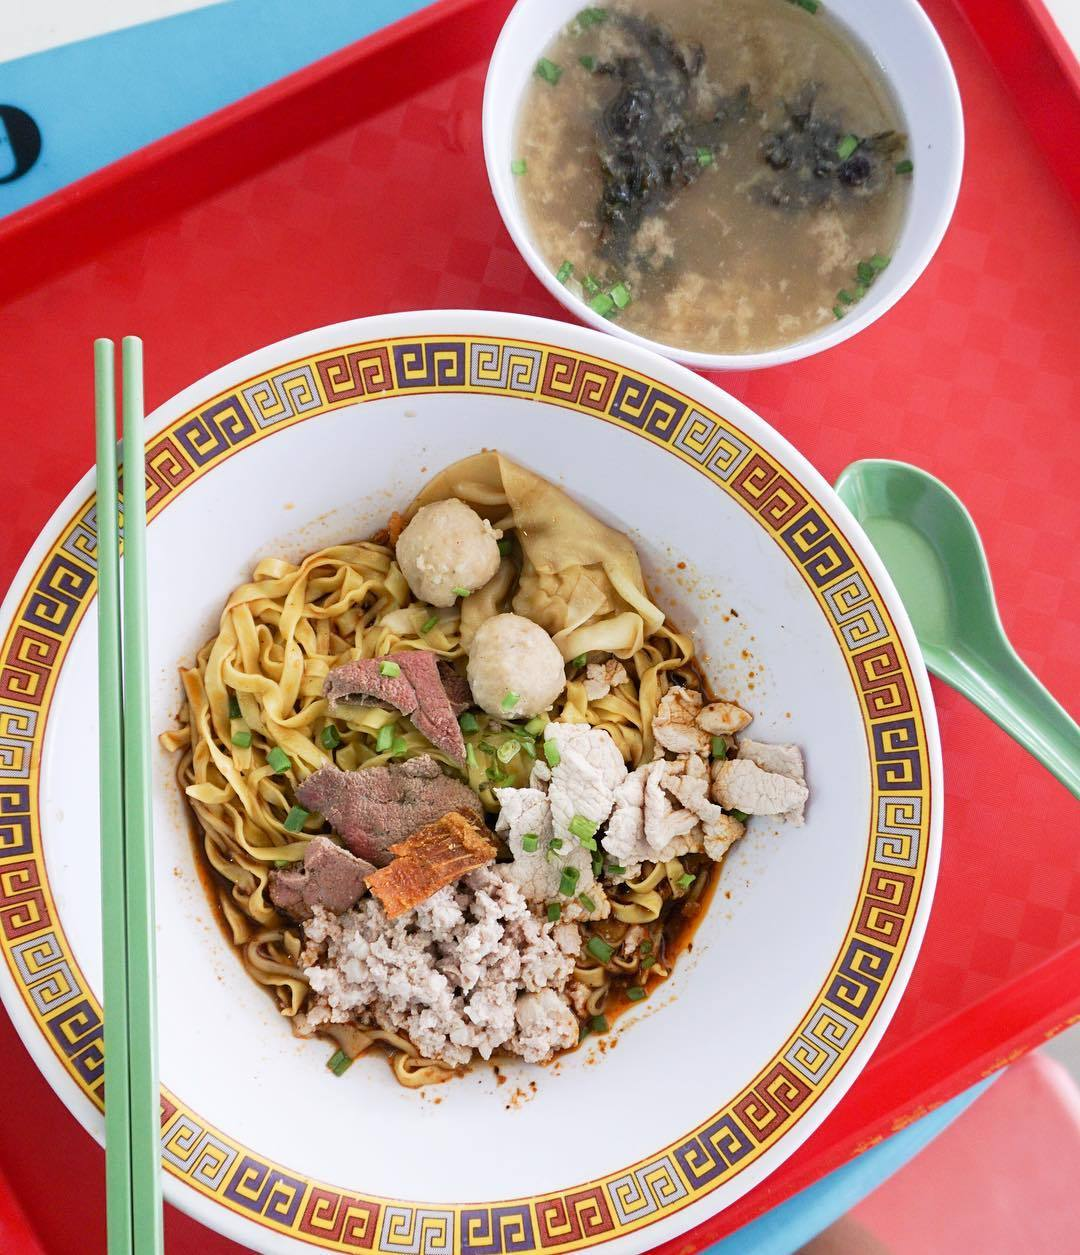 Michelin Hawker Dishes - Hill Street Tai Hwa Pork Noodle